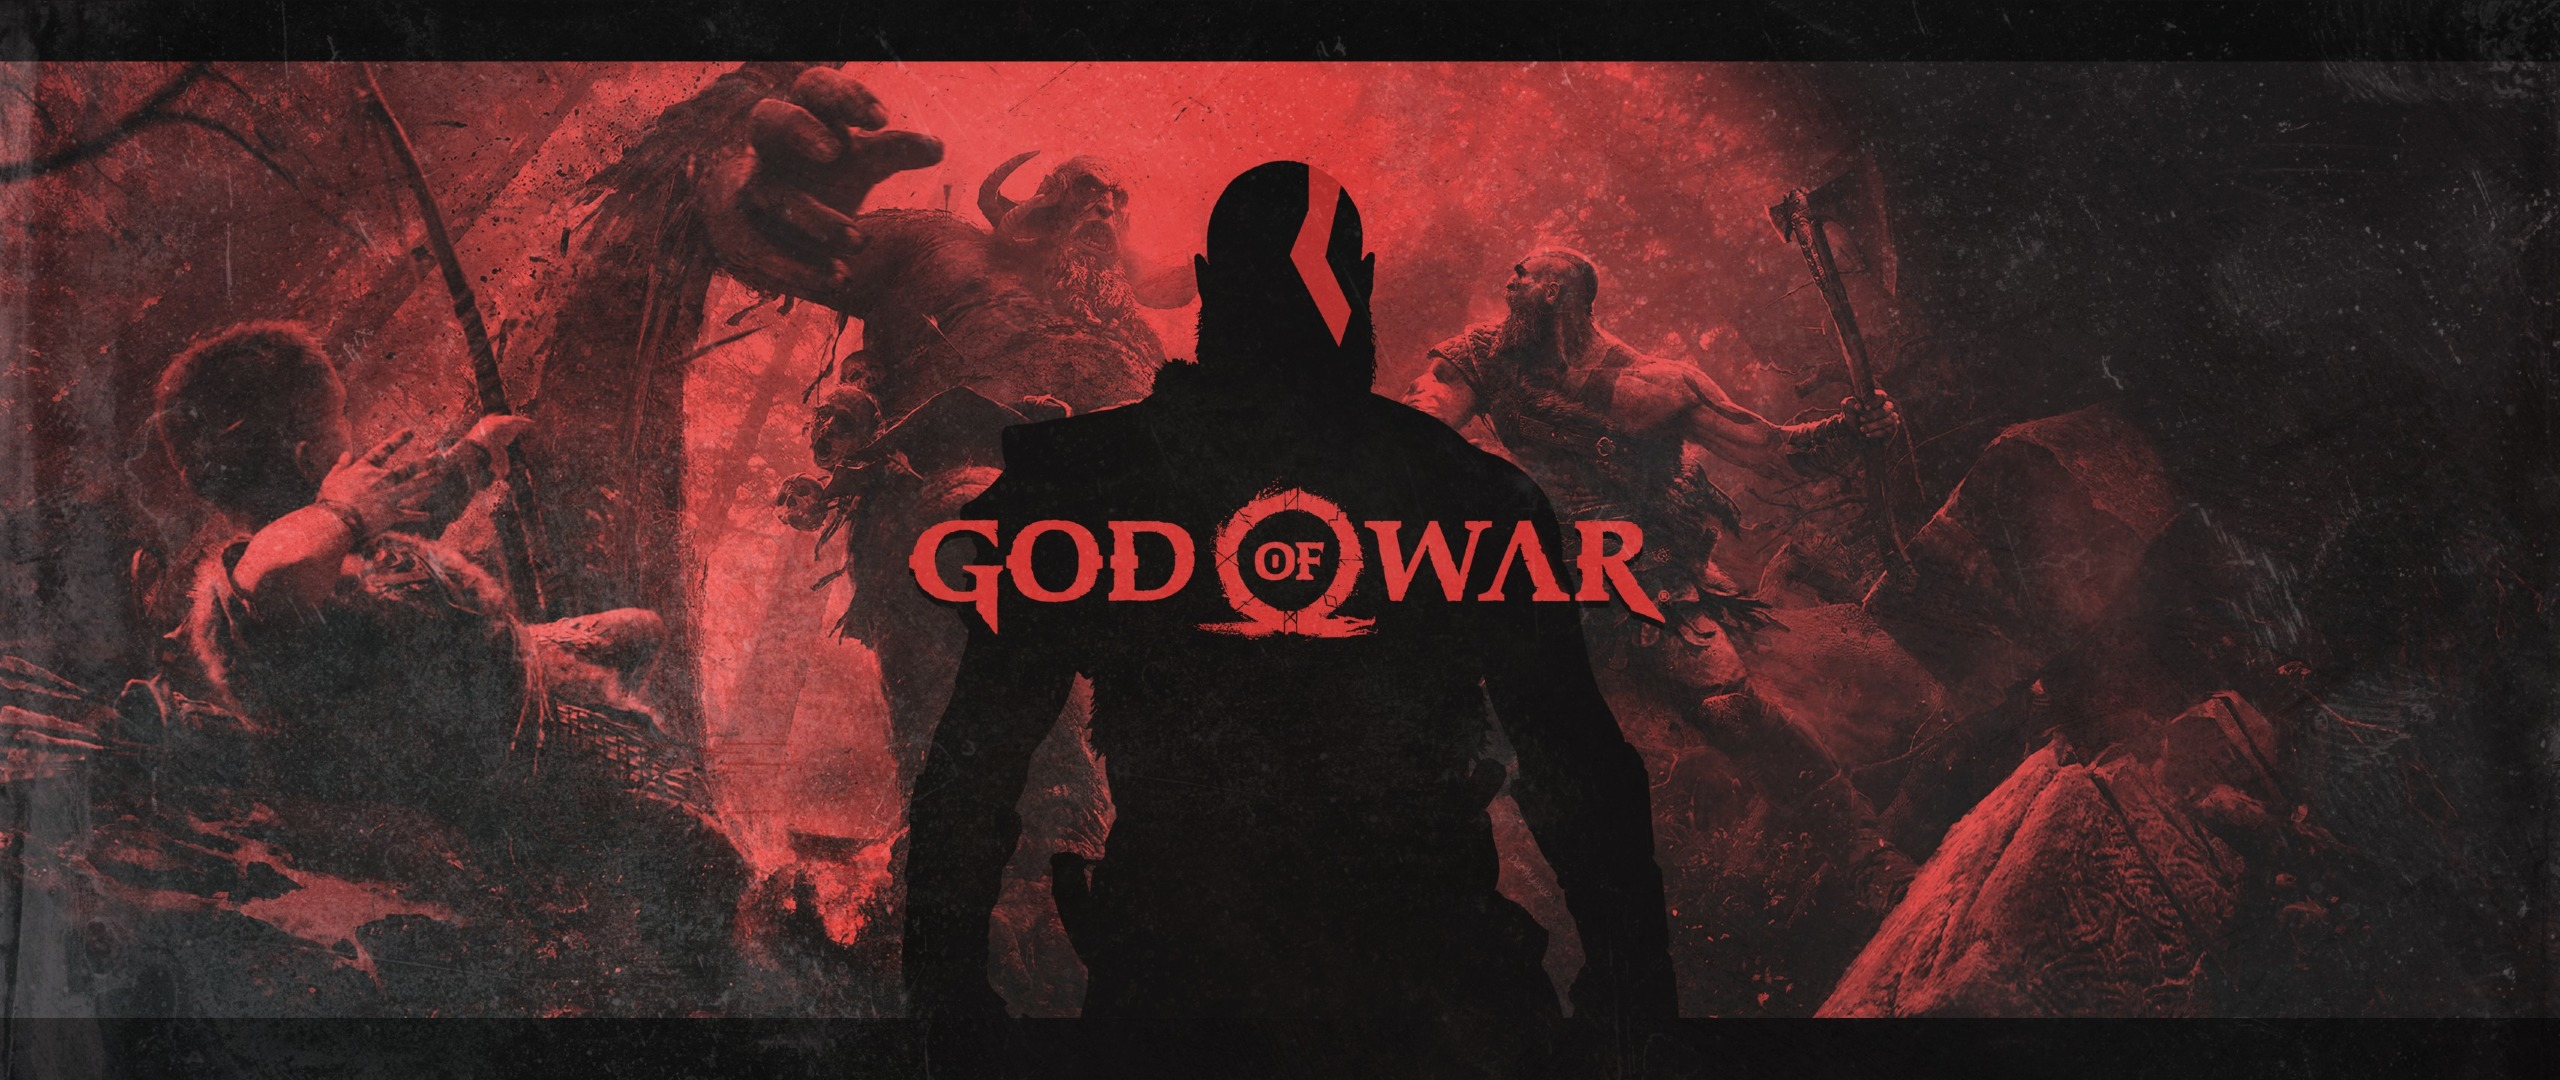 God Of War 4 Video Game Poster, HD 4K Wallpaper